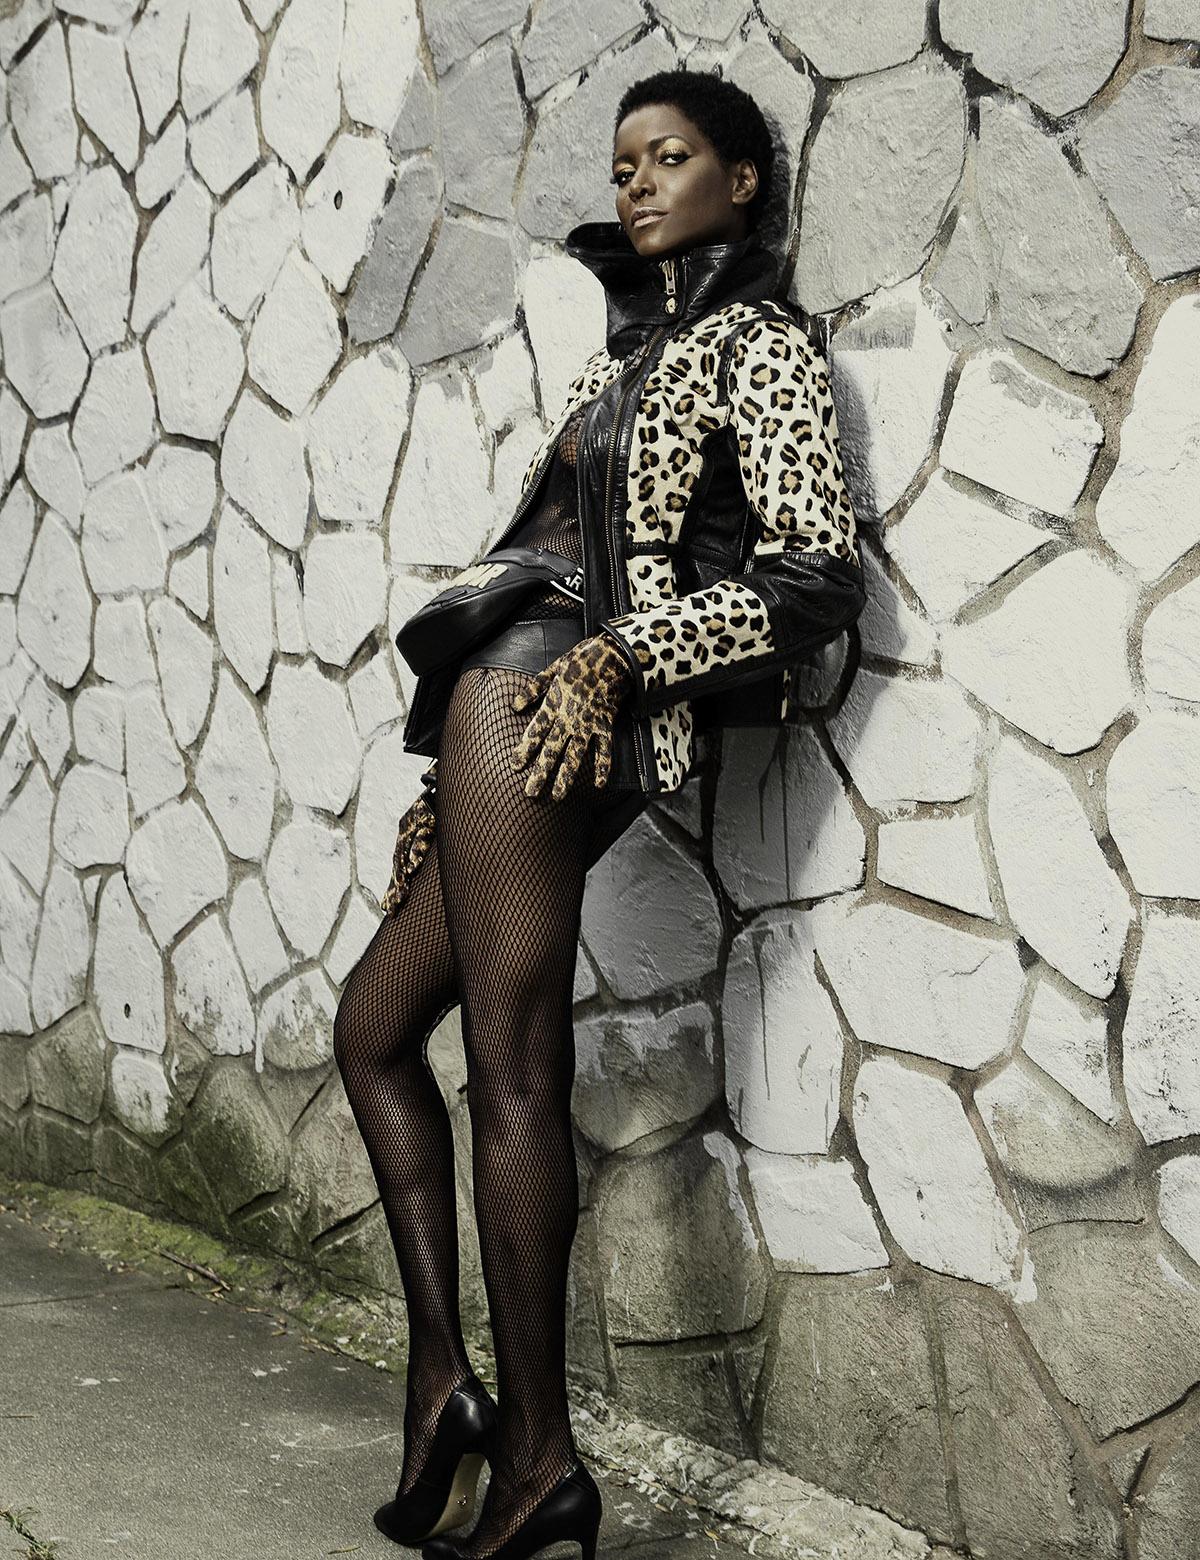 Spirit-&-Flesh-Magazine_model-DAHLIA-JAMES_by_RON-CONTARSY_02